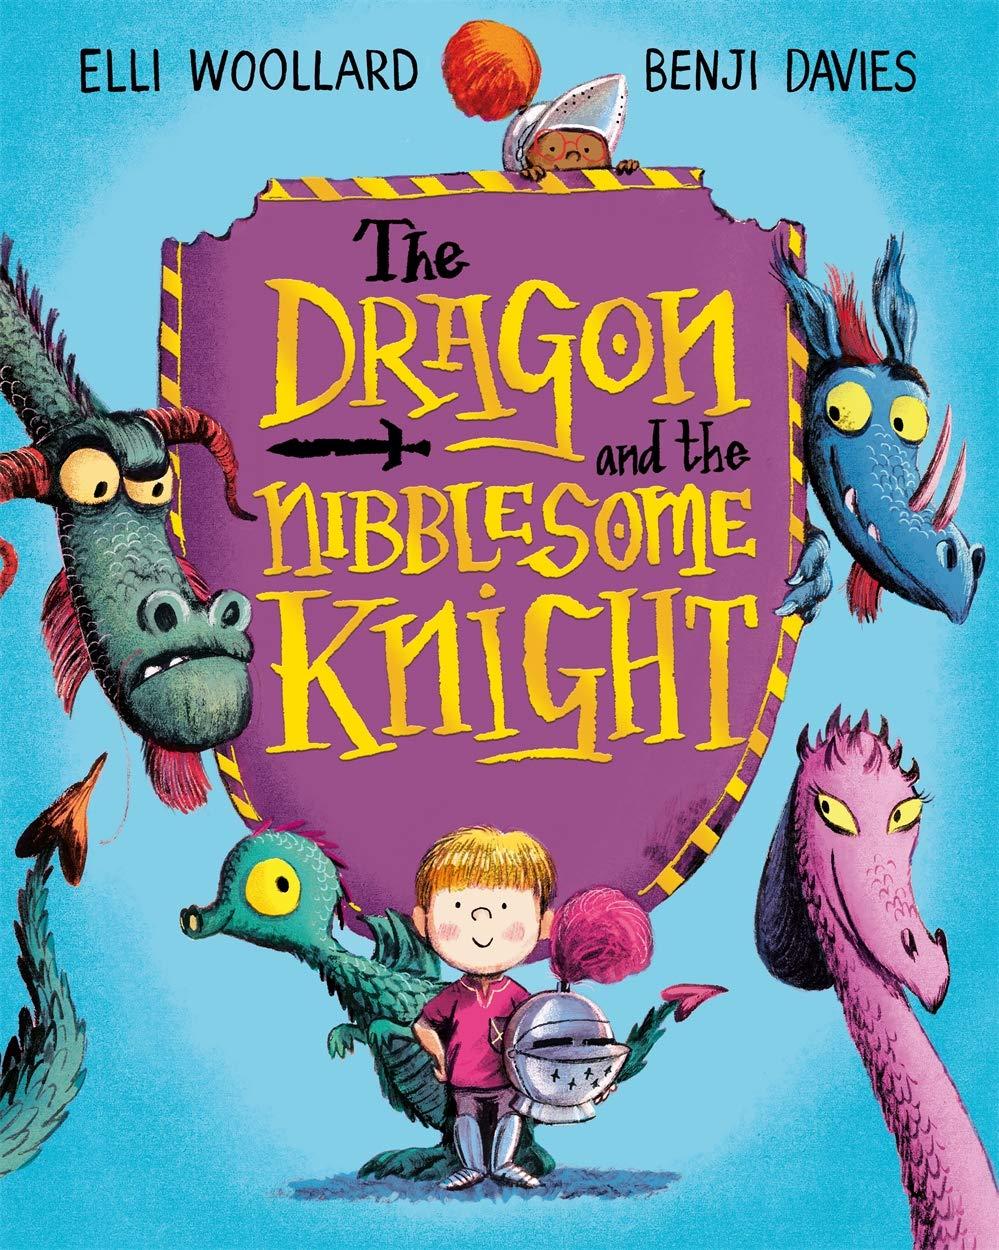 The Dragon and the Nibblesome Knight: Amazon.co.uk: Woollard, Elli, Davies,  Benji: Books